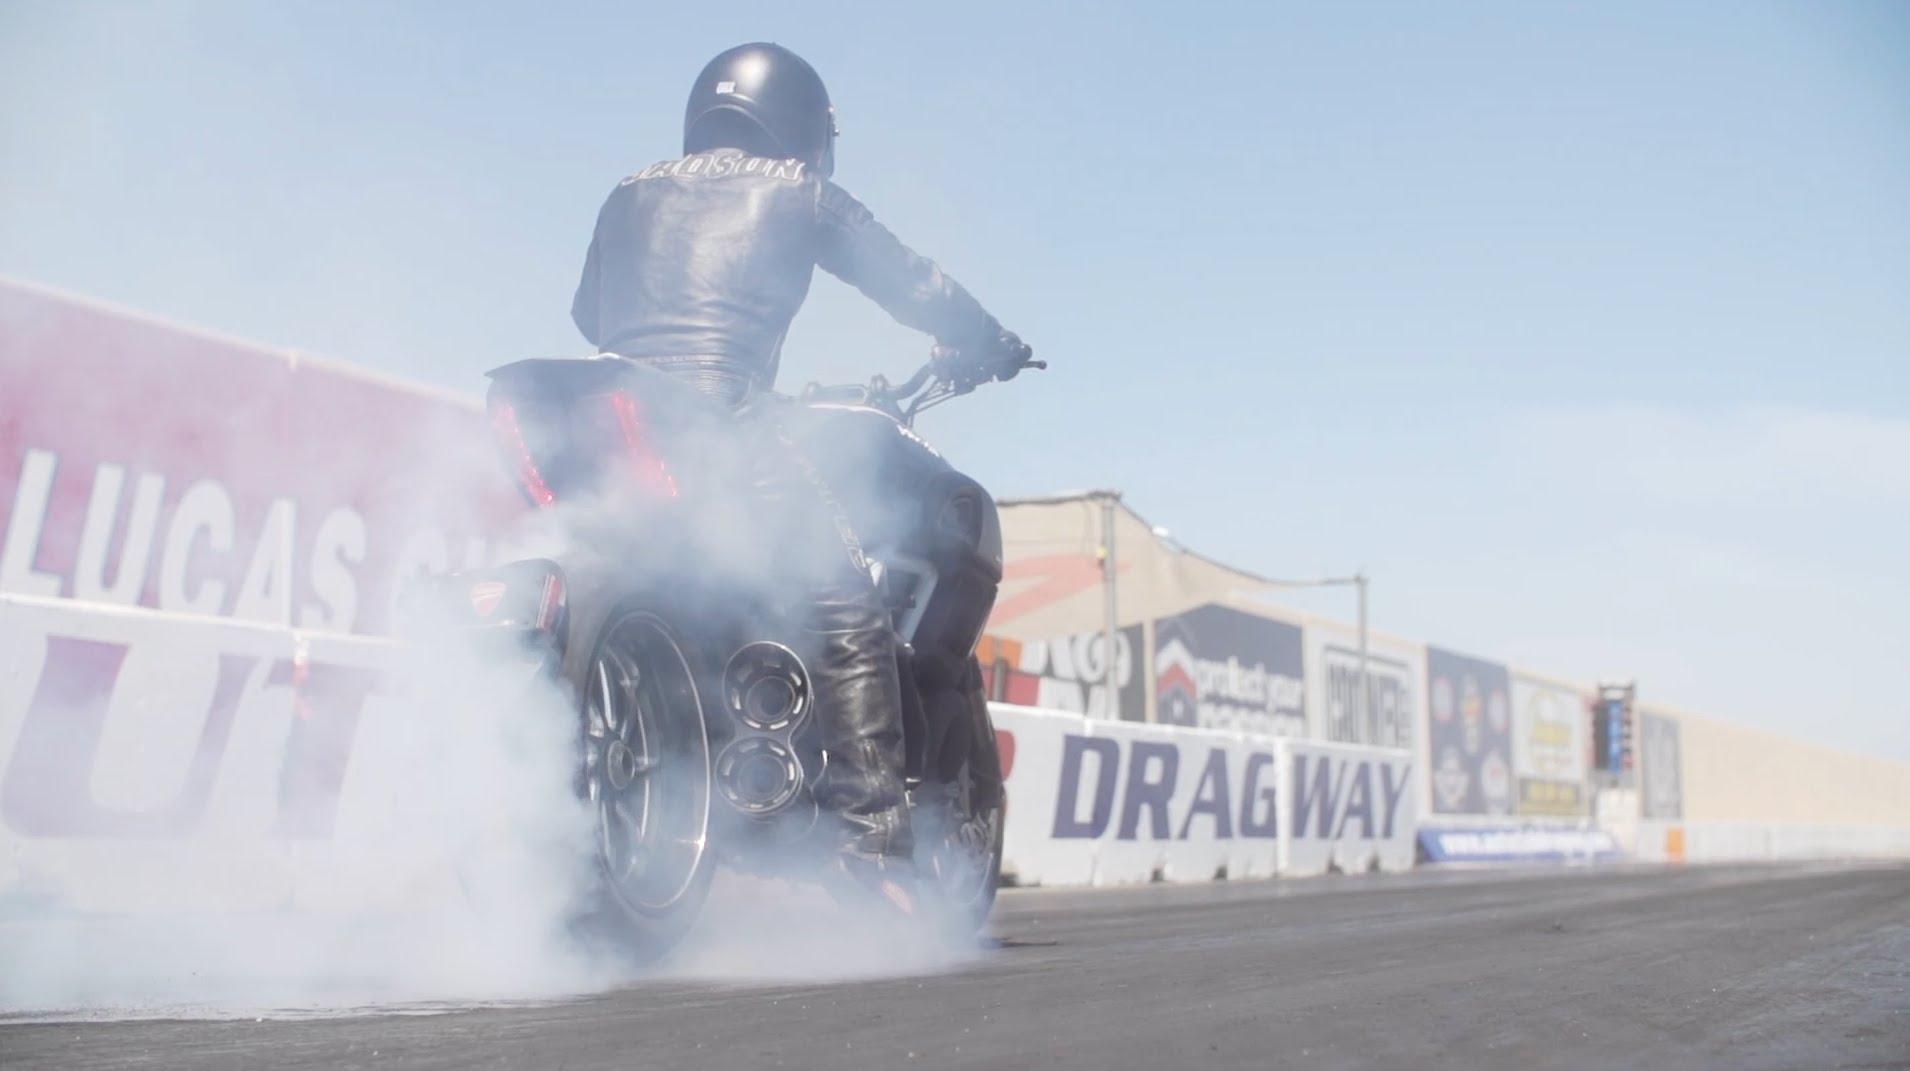 Smoked: 2015 Ducati Diavel vs 2014 Chevy Corvette Stingray Drag Race